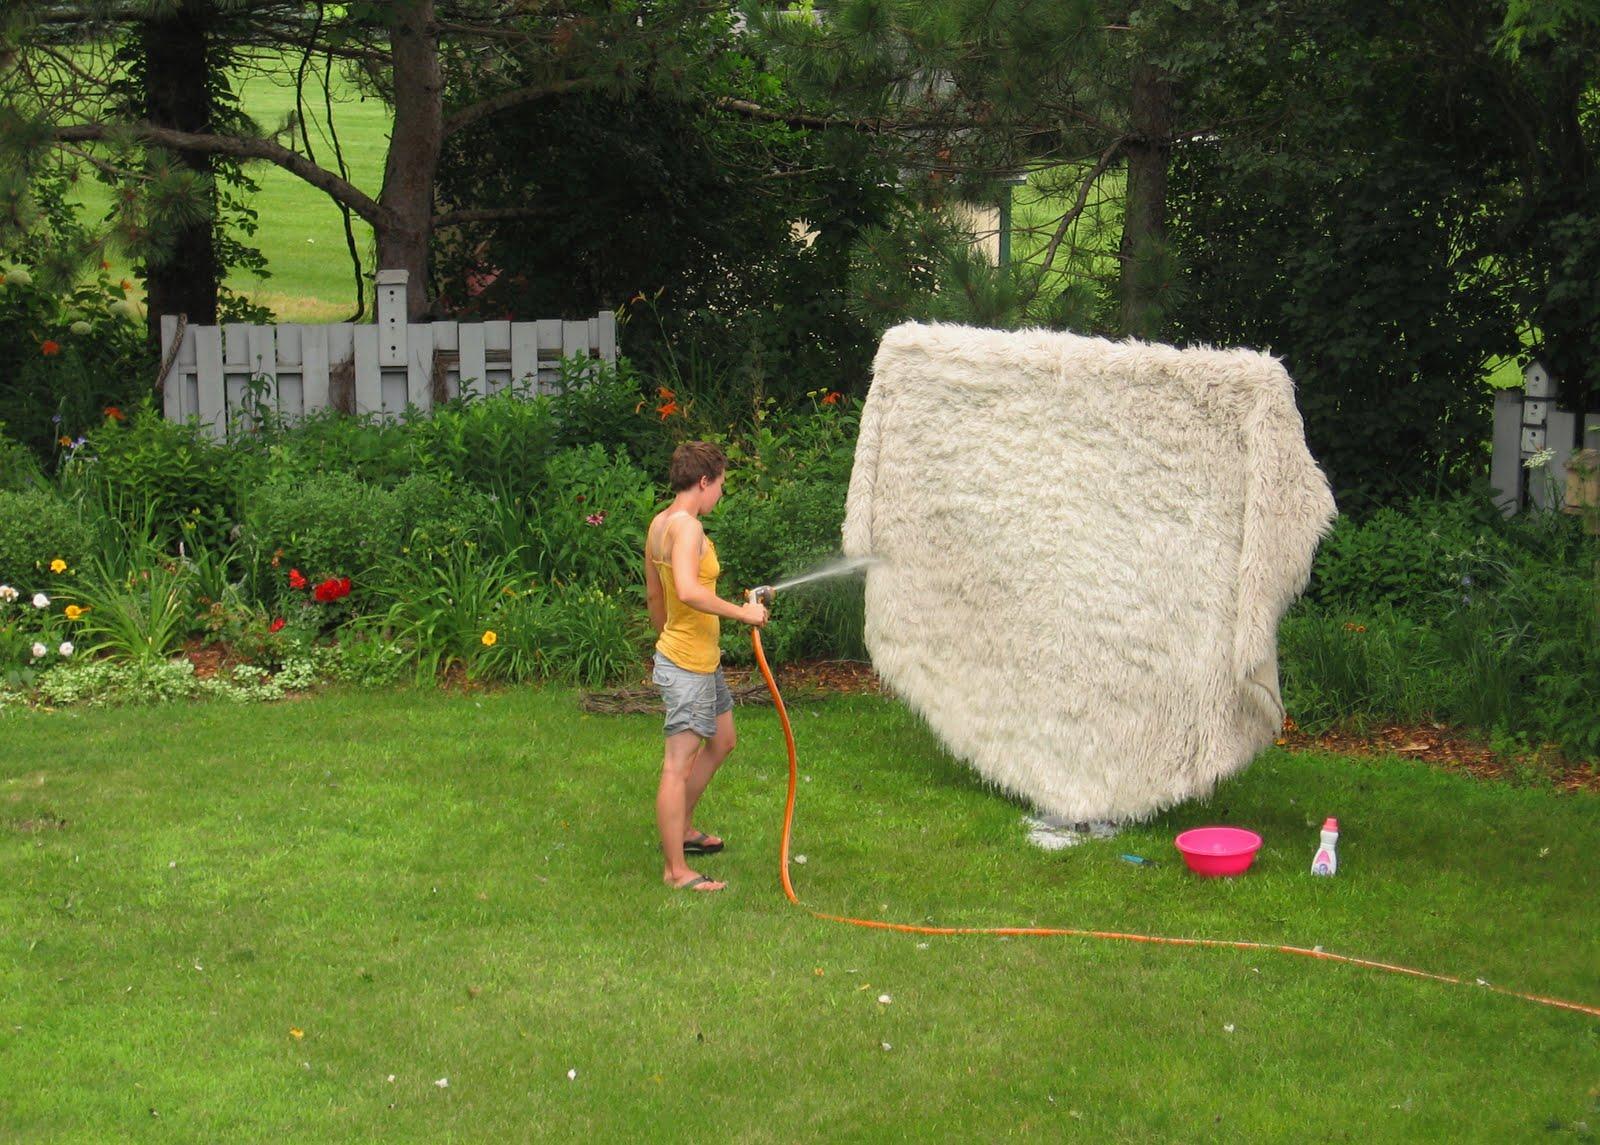 How to clean a flokati rug - Washing A Flokati Rug Rugs Ideas